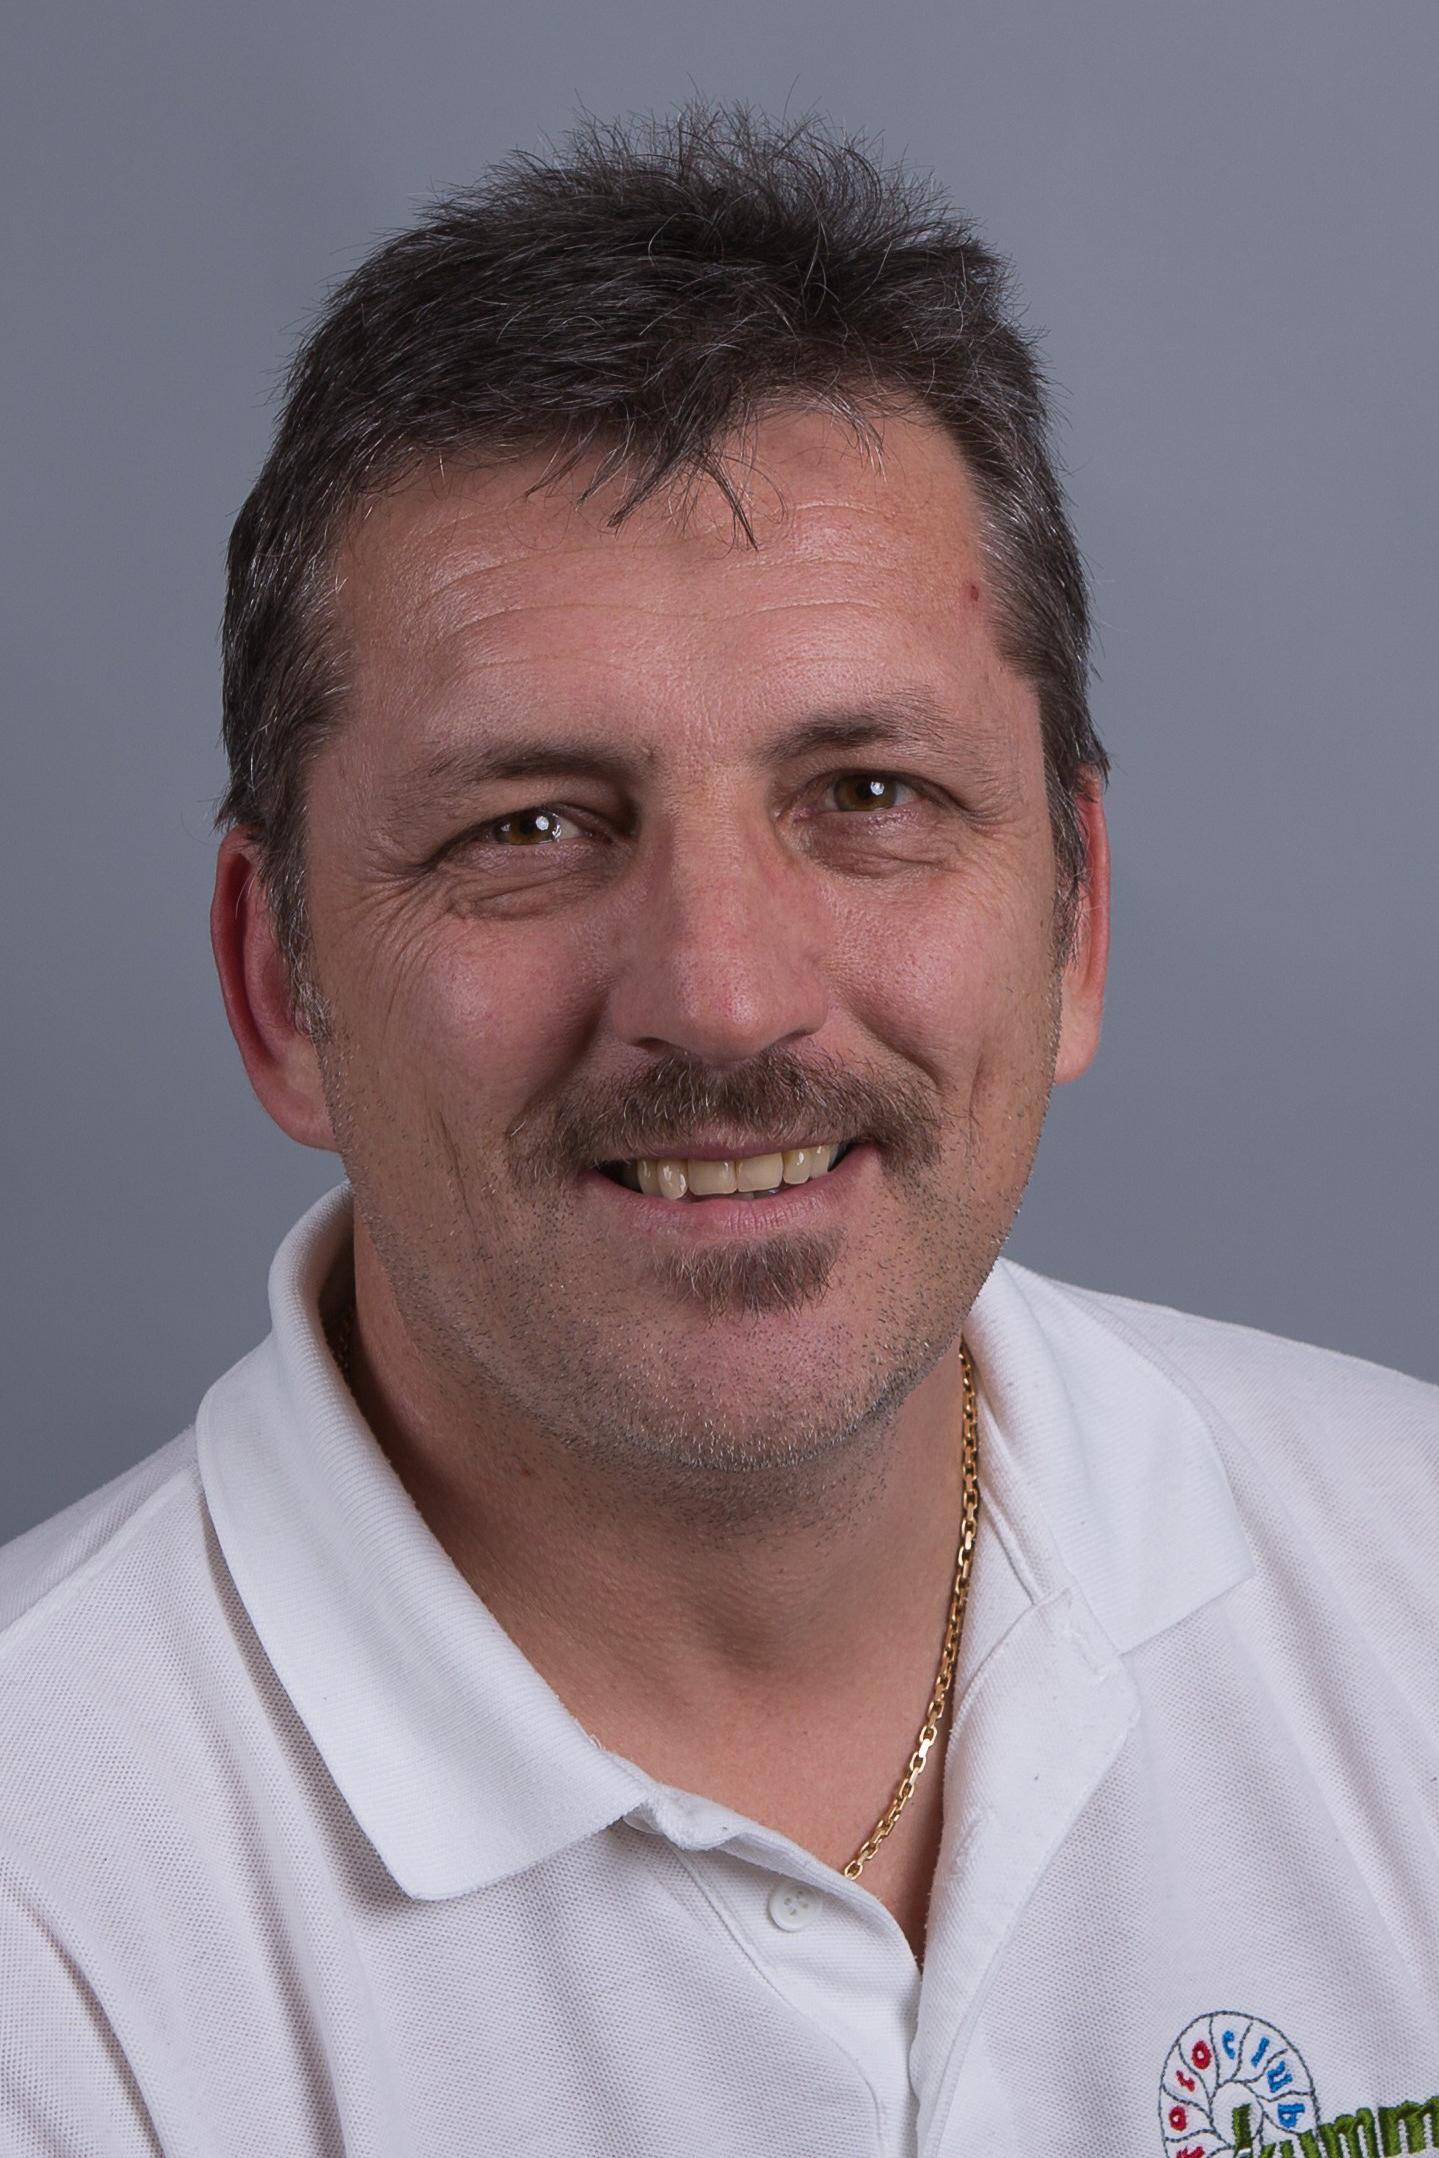 Jürgen Grasmuck